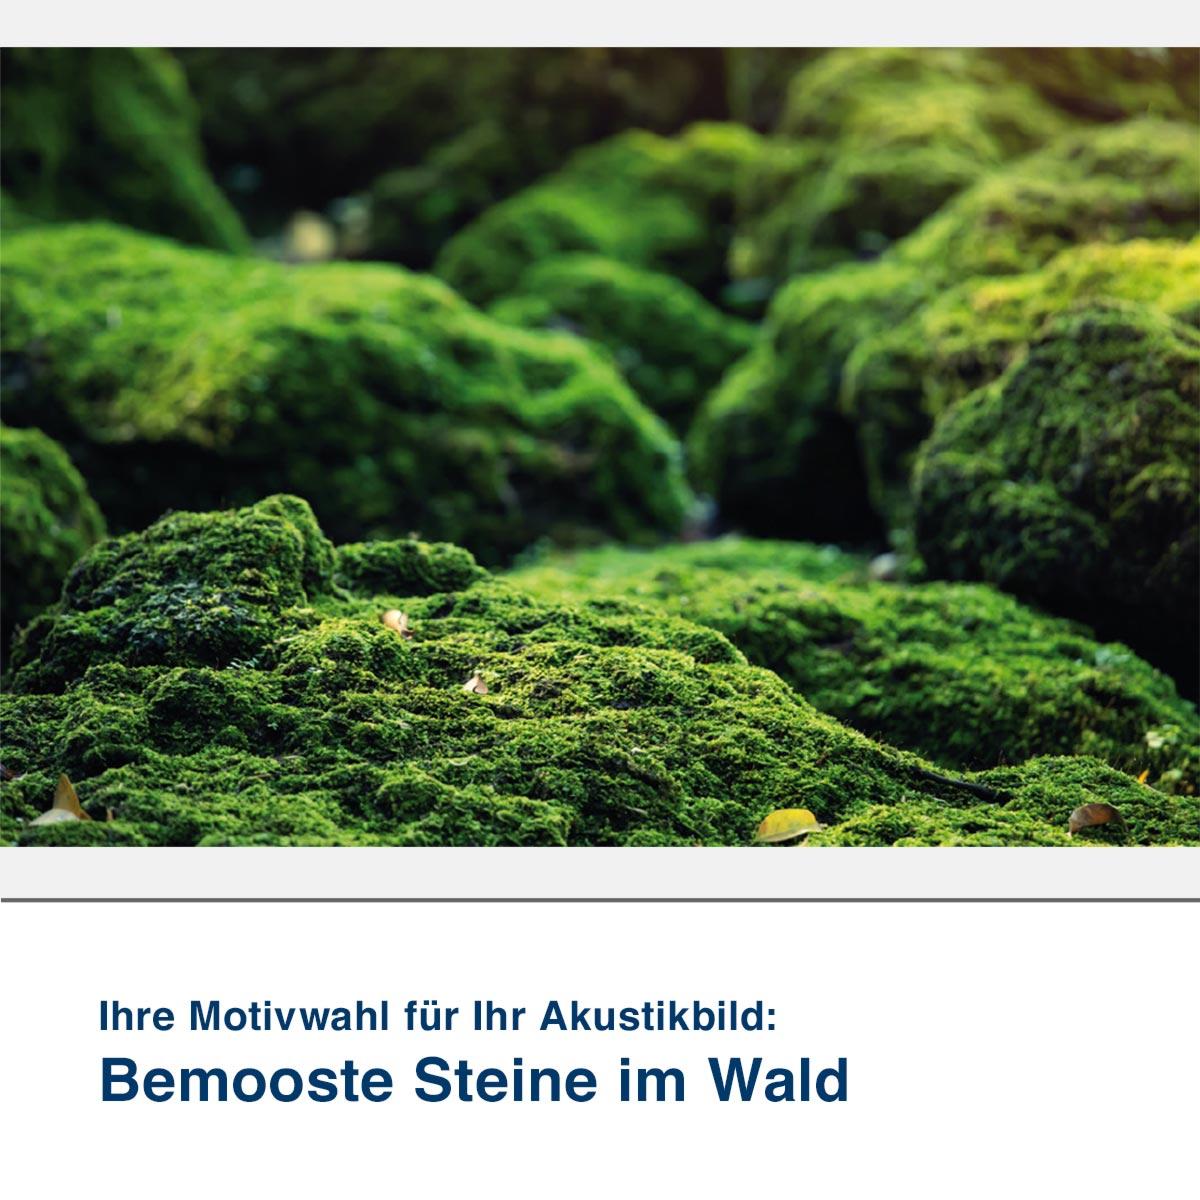 Akustikbild Motiv Bemooste Steine im Wald